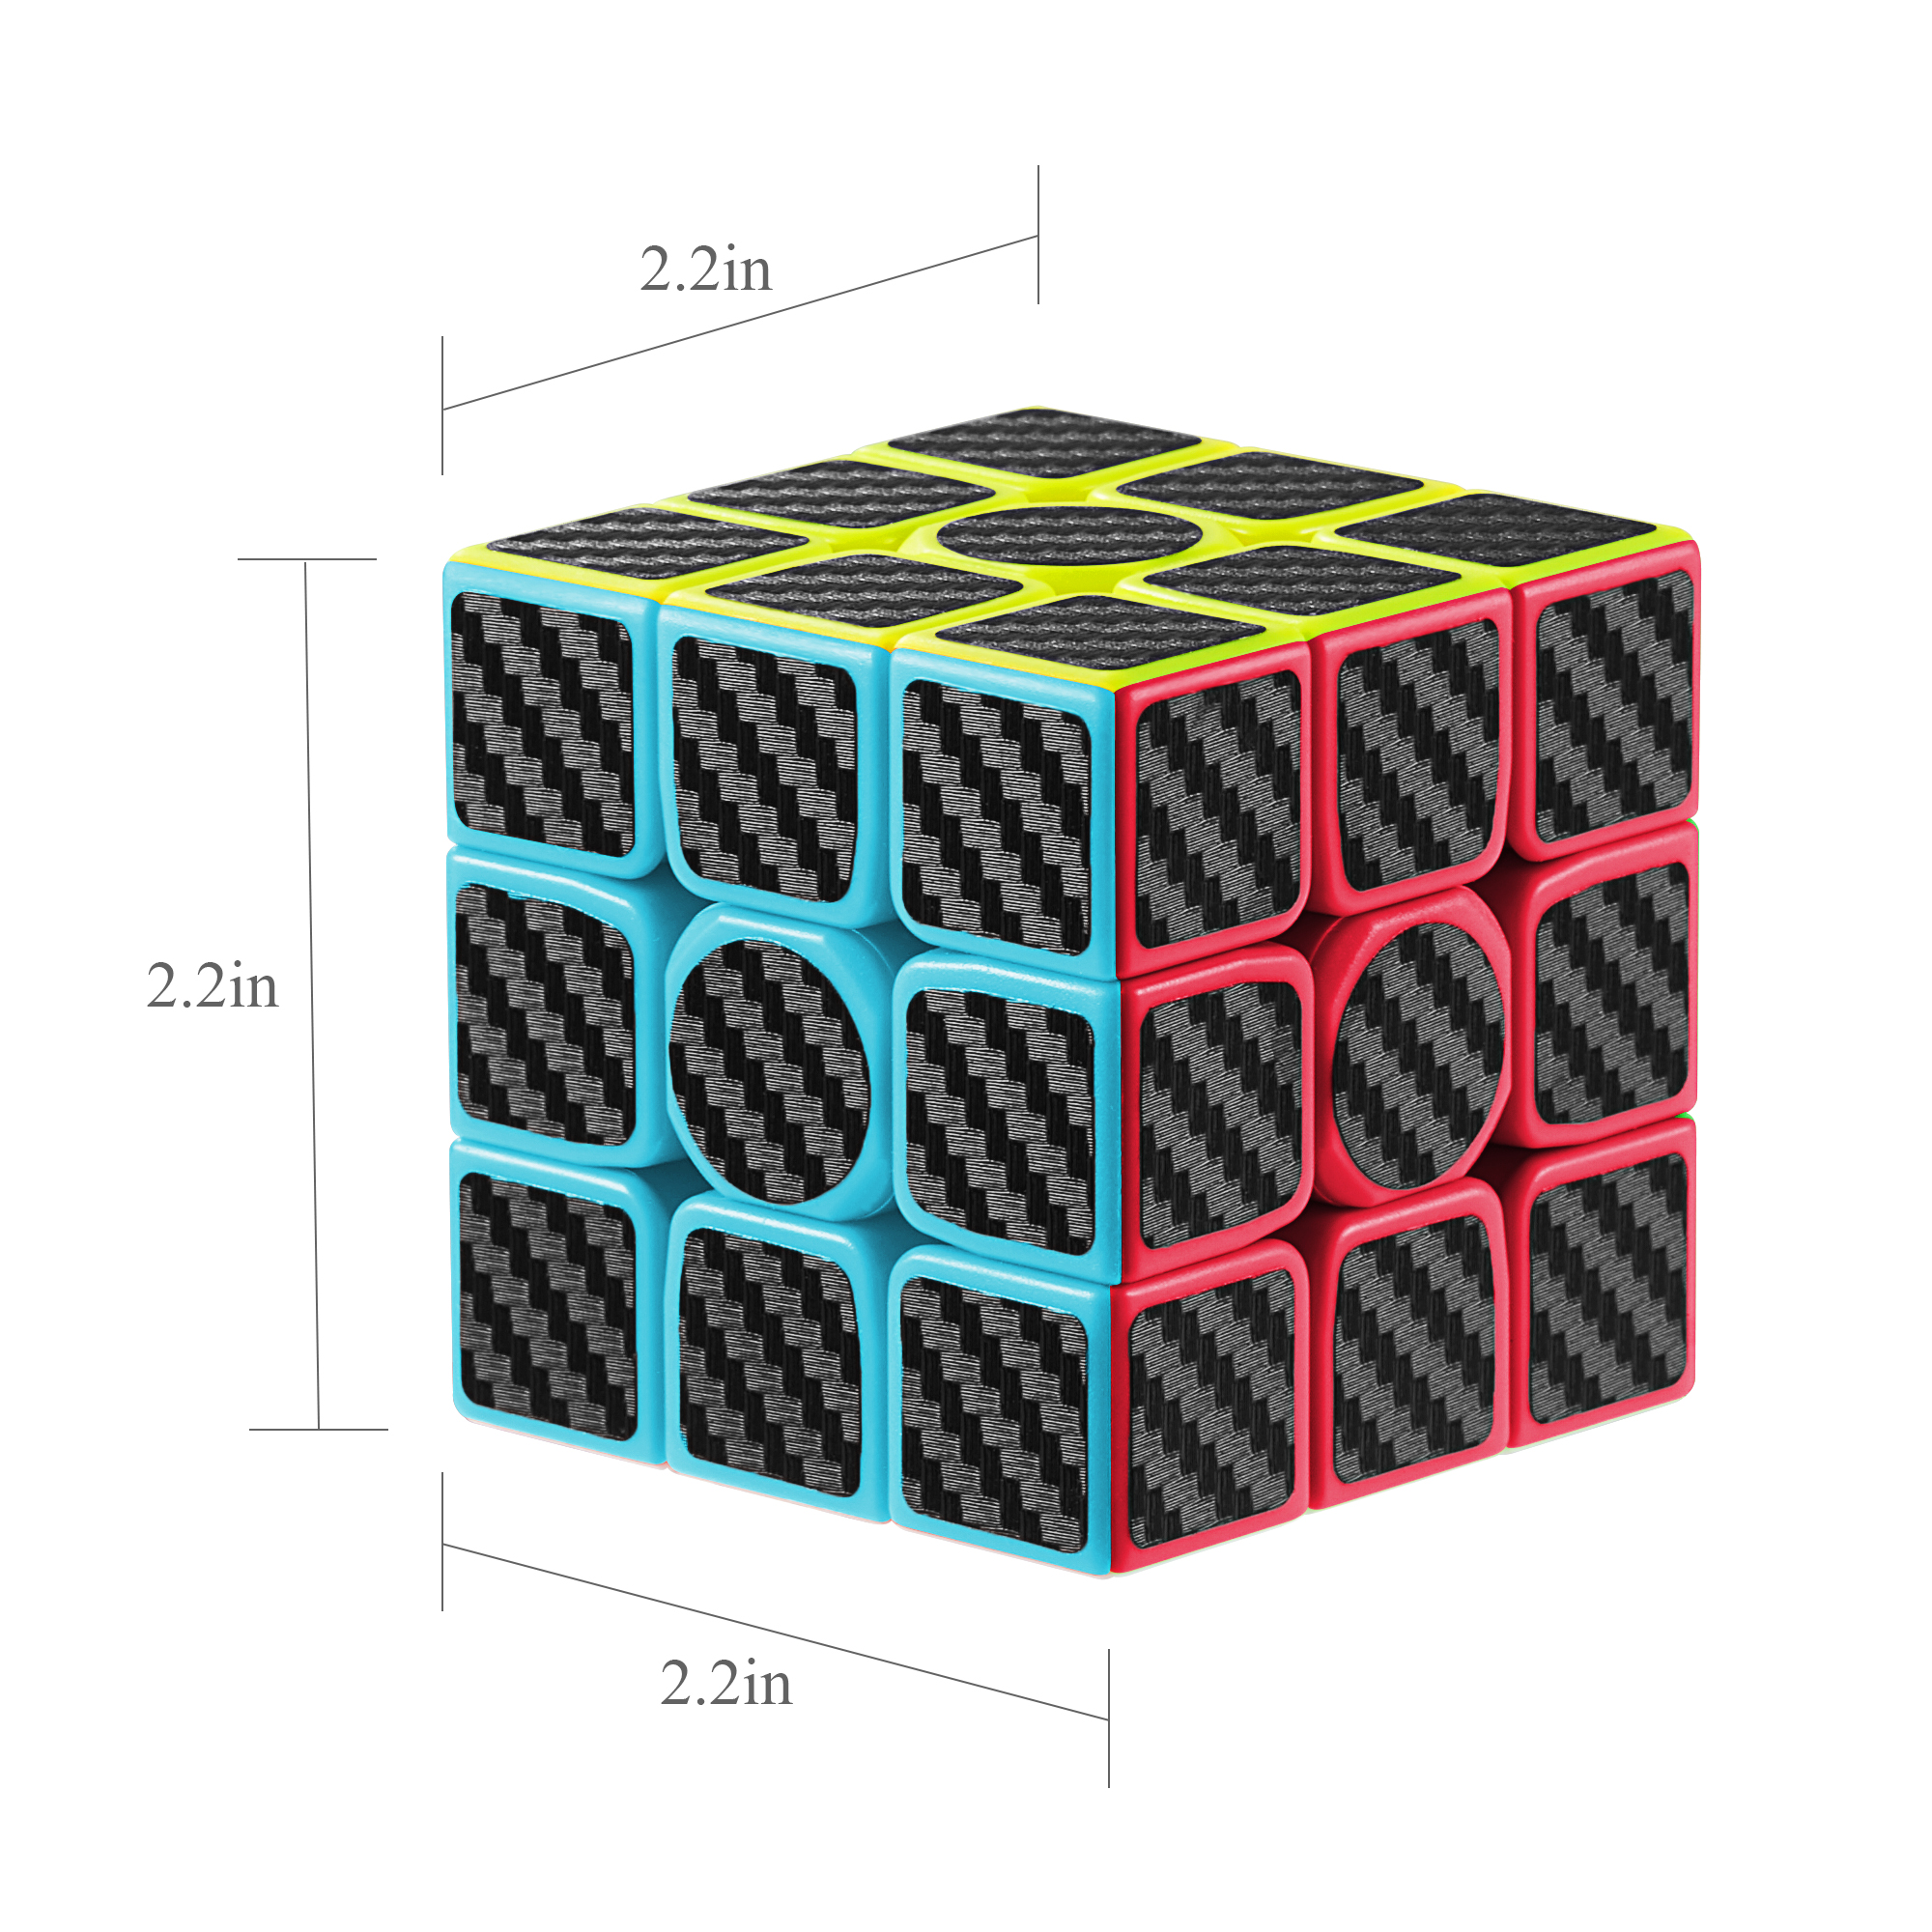 3 x 3 Stickerless Speed Magic Rubix Cube Rubiks Cube Kids Adults Fun Puzzle Toys